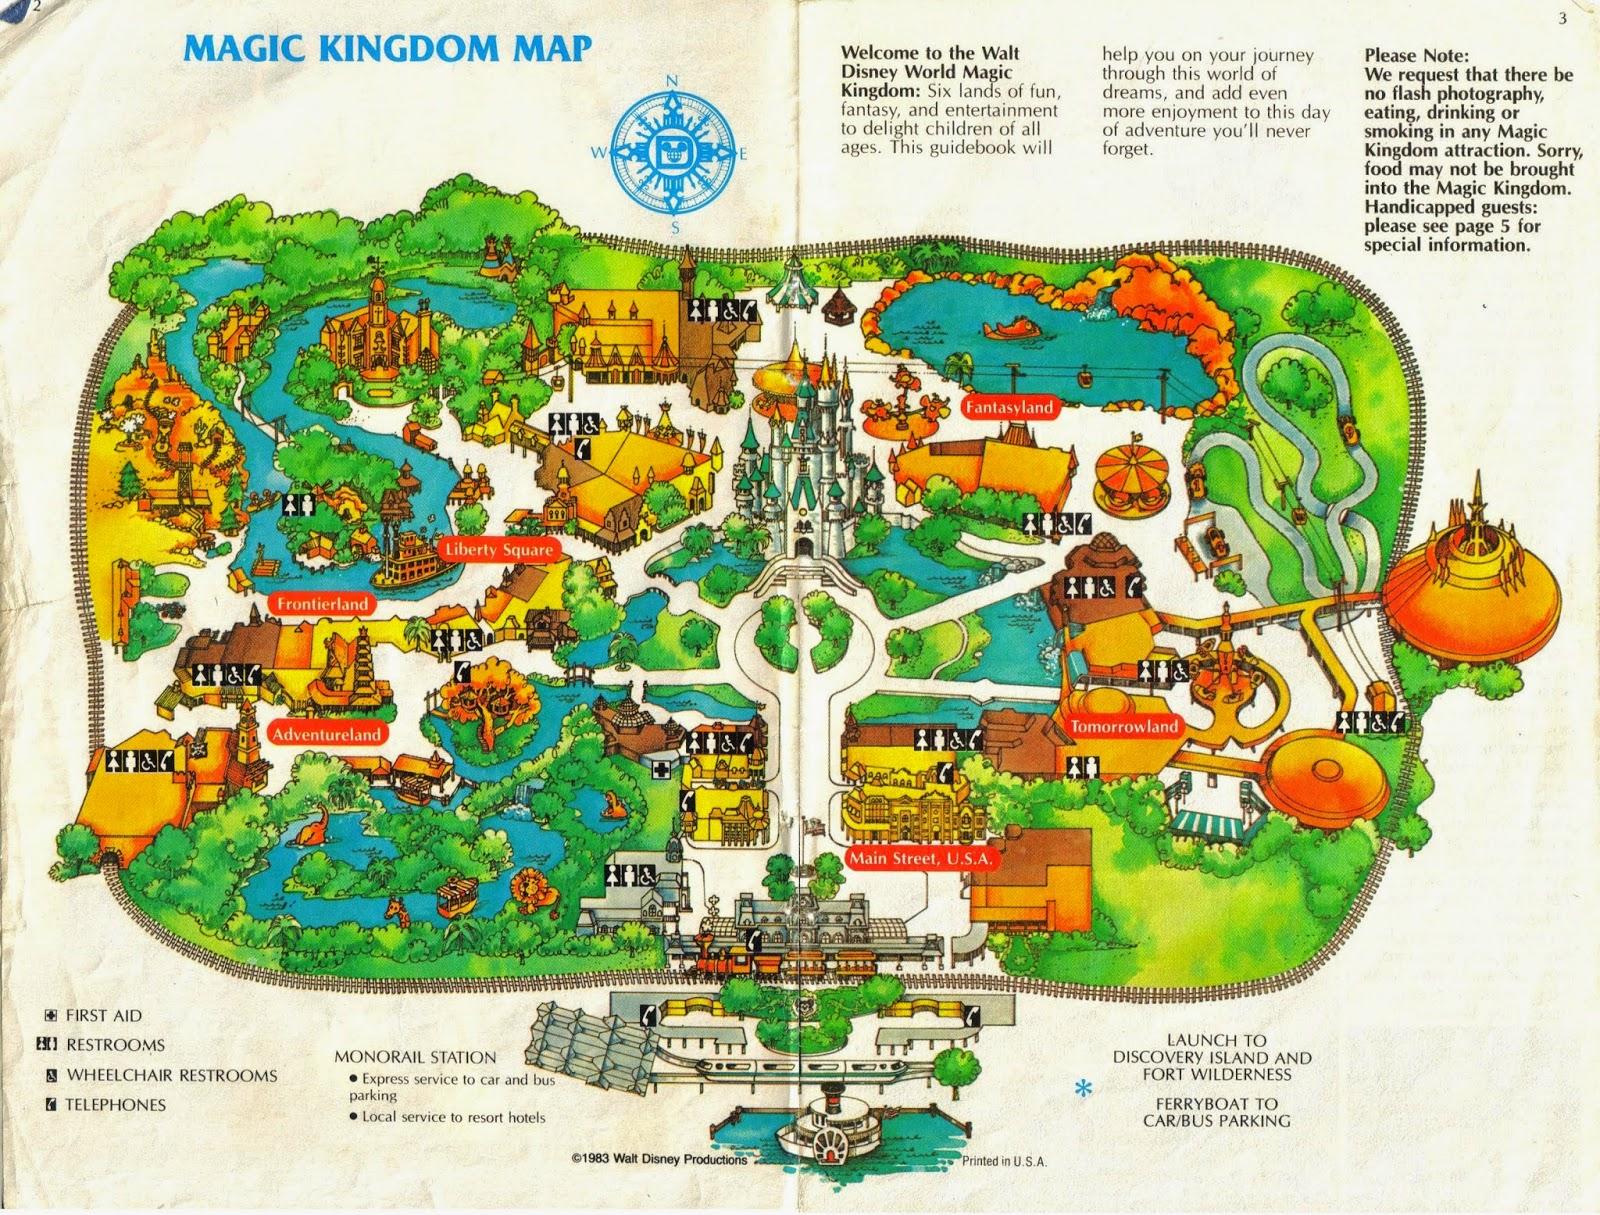 Wonderful Below: A 1983 Brochure For Walt Disney Worldu0027s Magic Kingdom, Disneyu0027s  First Theme Park In Orlando, Opened On 1 October 1971: